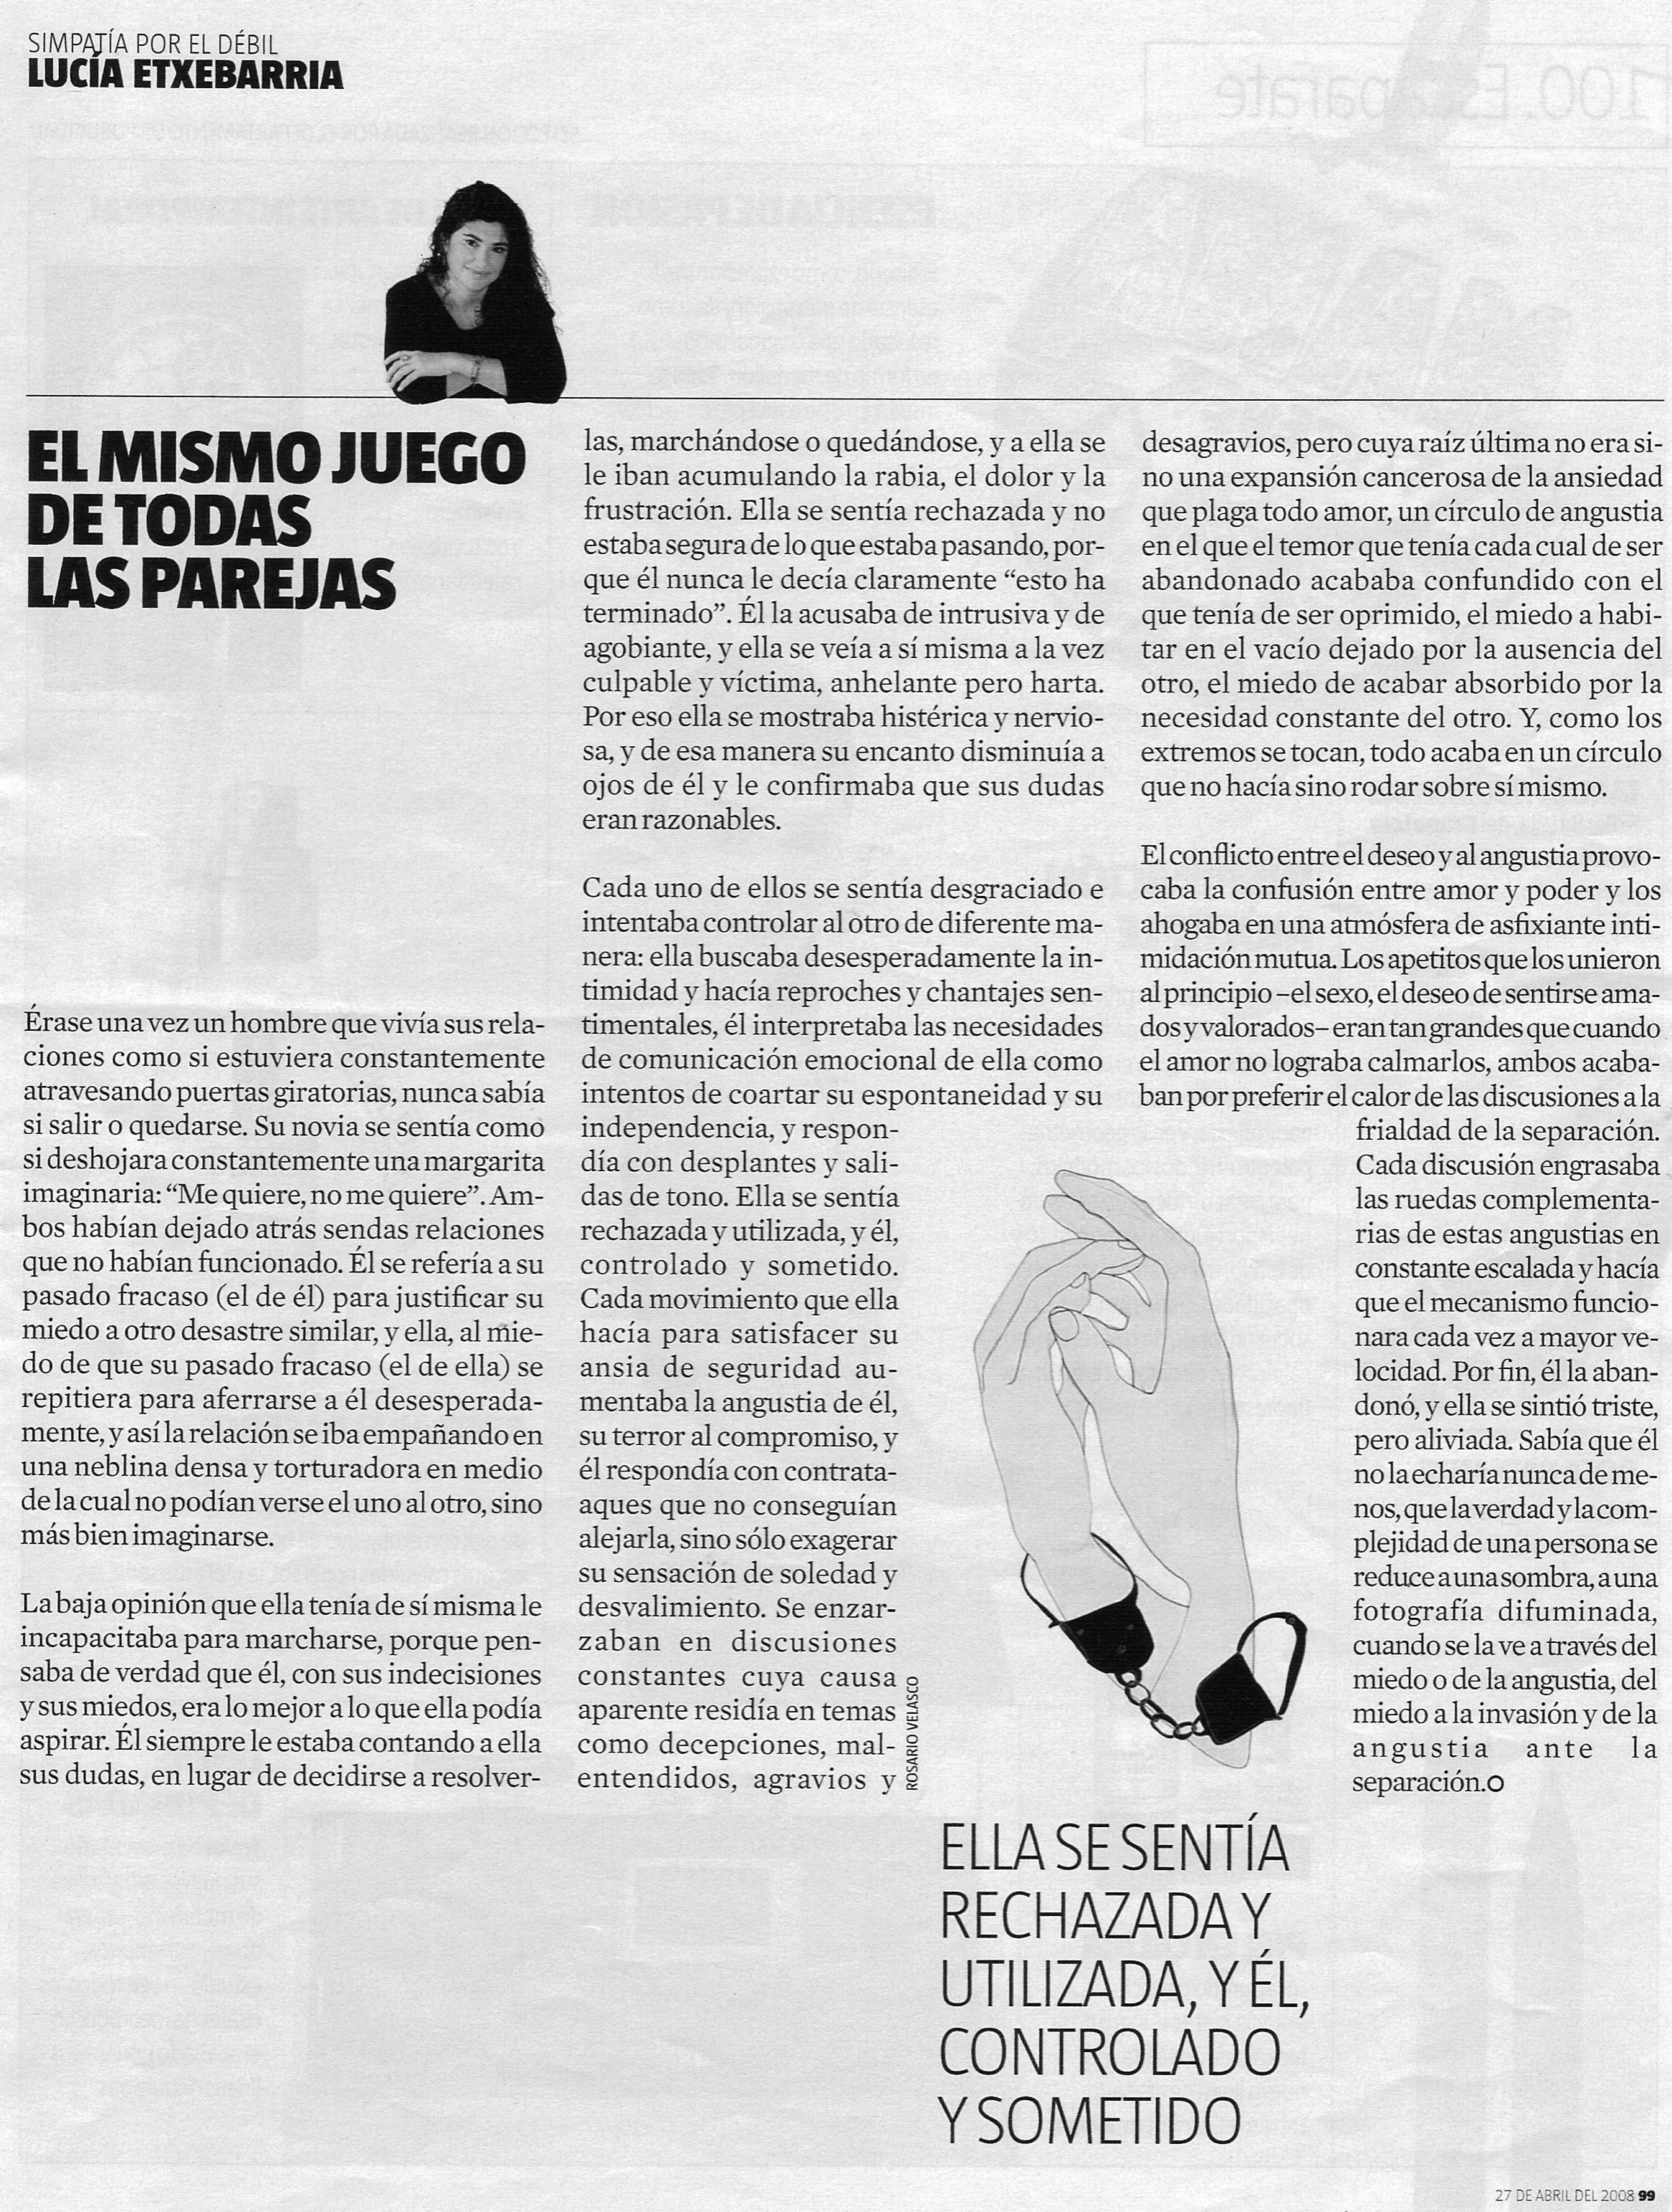 UNA FRASE DE LUCÍA ETXEBARRIA. - Página 3 85_2_art.parejaLuciaEtxebarria